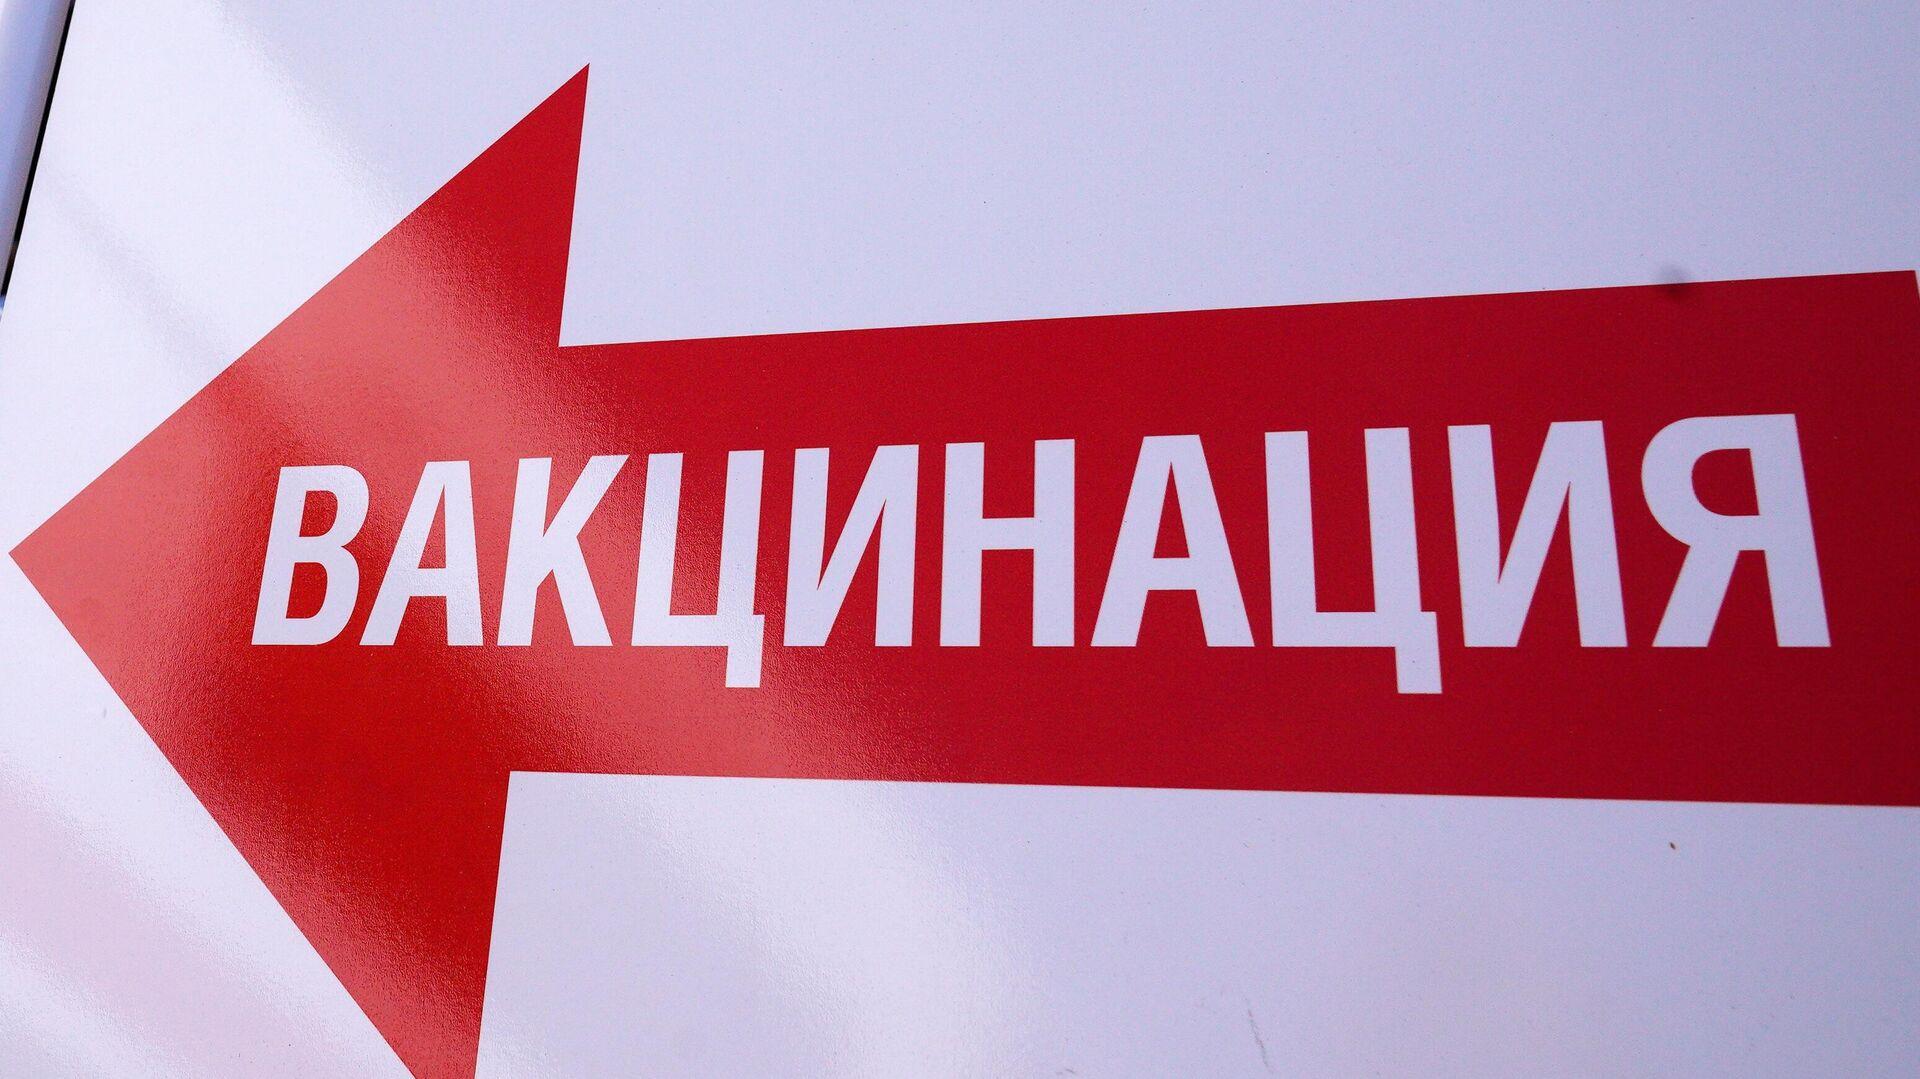 Очереди на вакцинацию против коронавируса в Калининграде - Sputnik Таджикистан, 1920, 30.06.2021